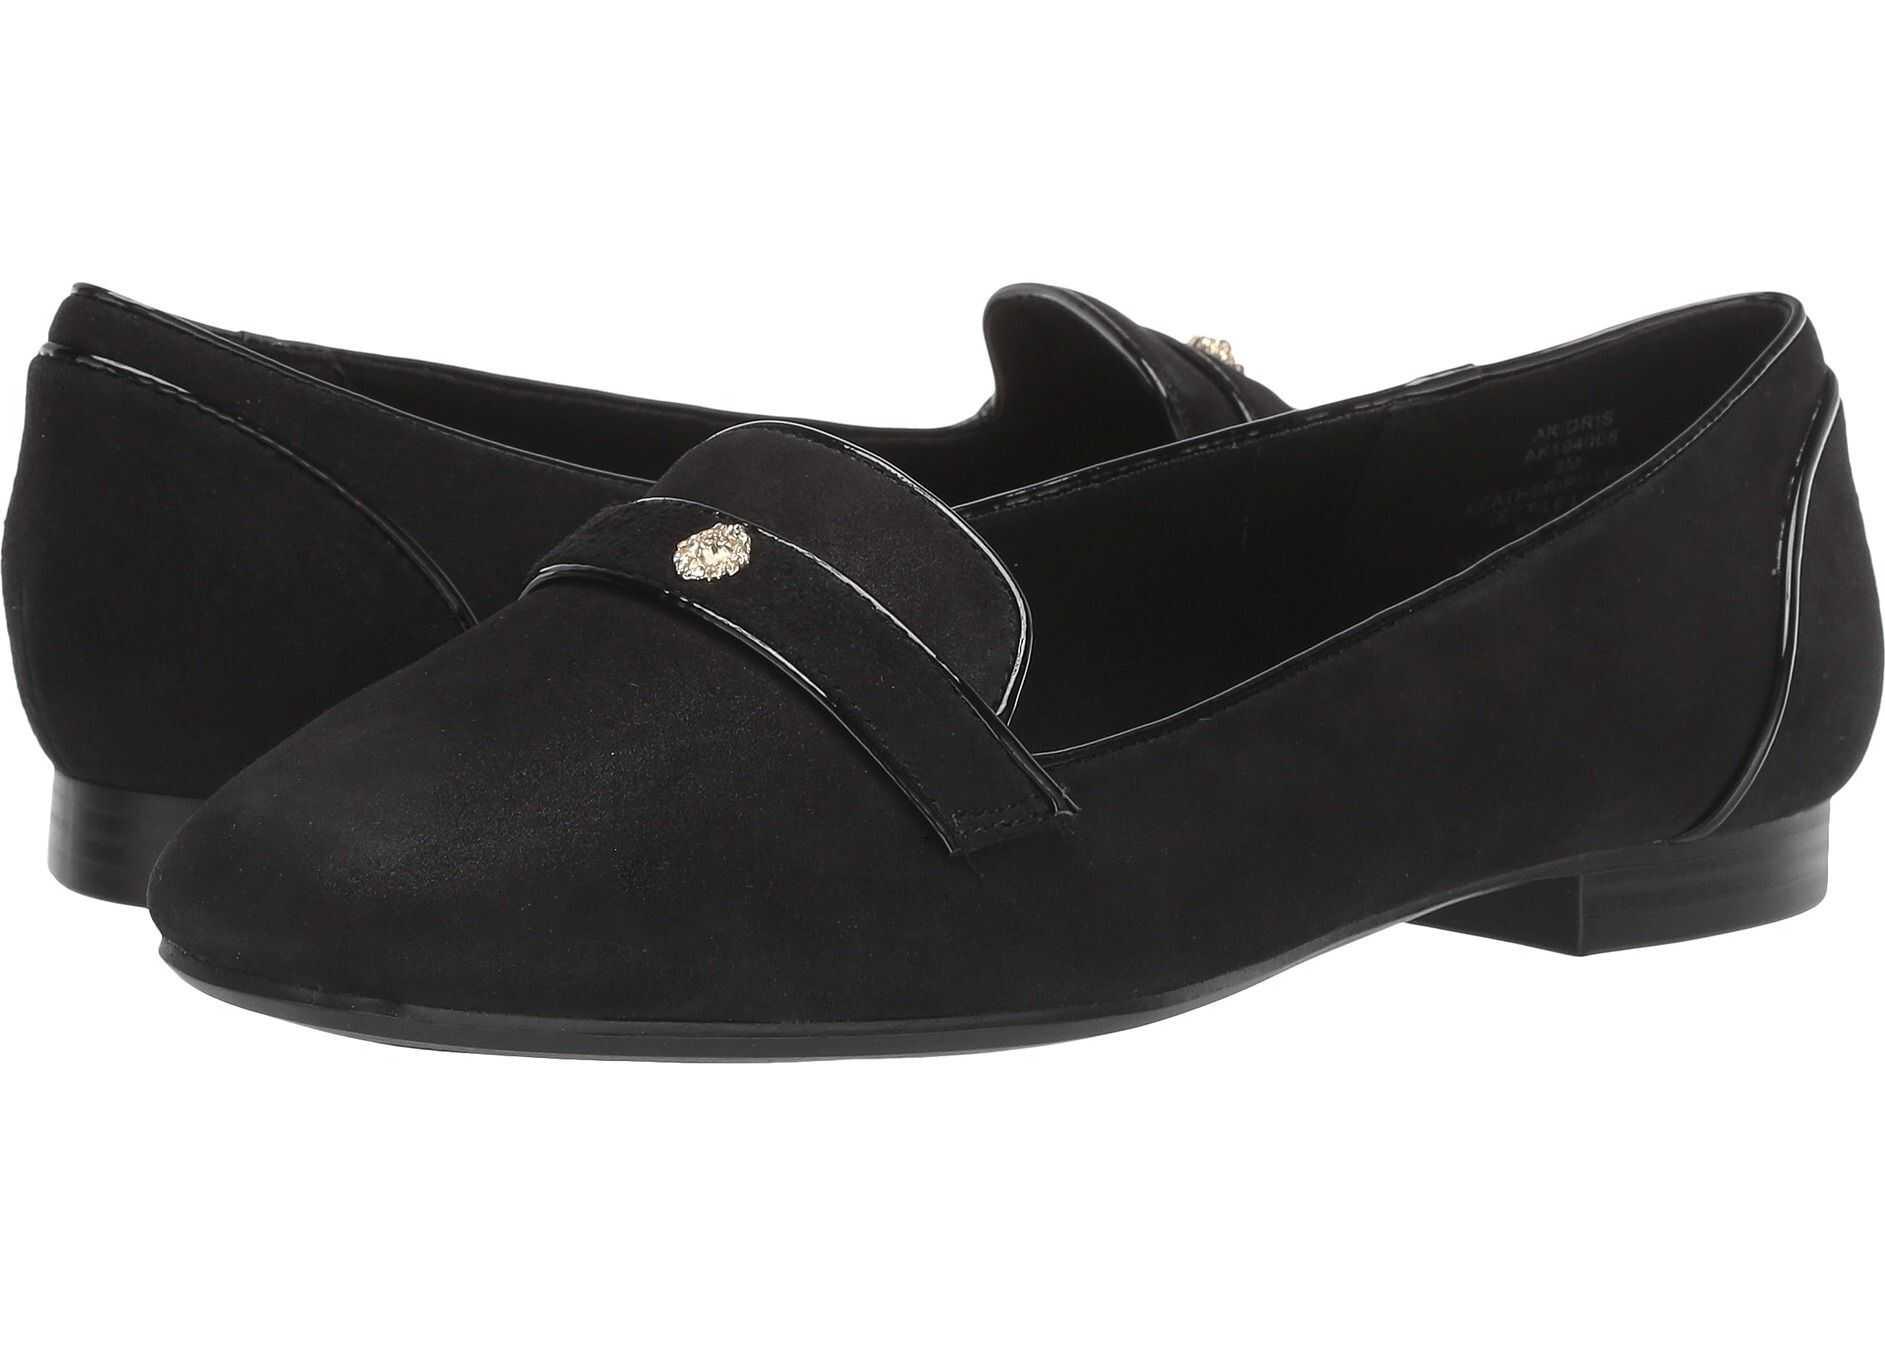 Anne Klein Idris Black Leather